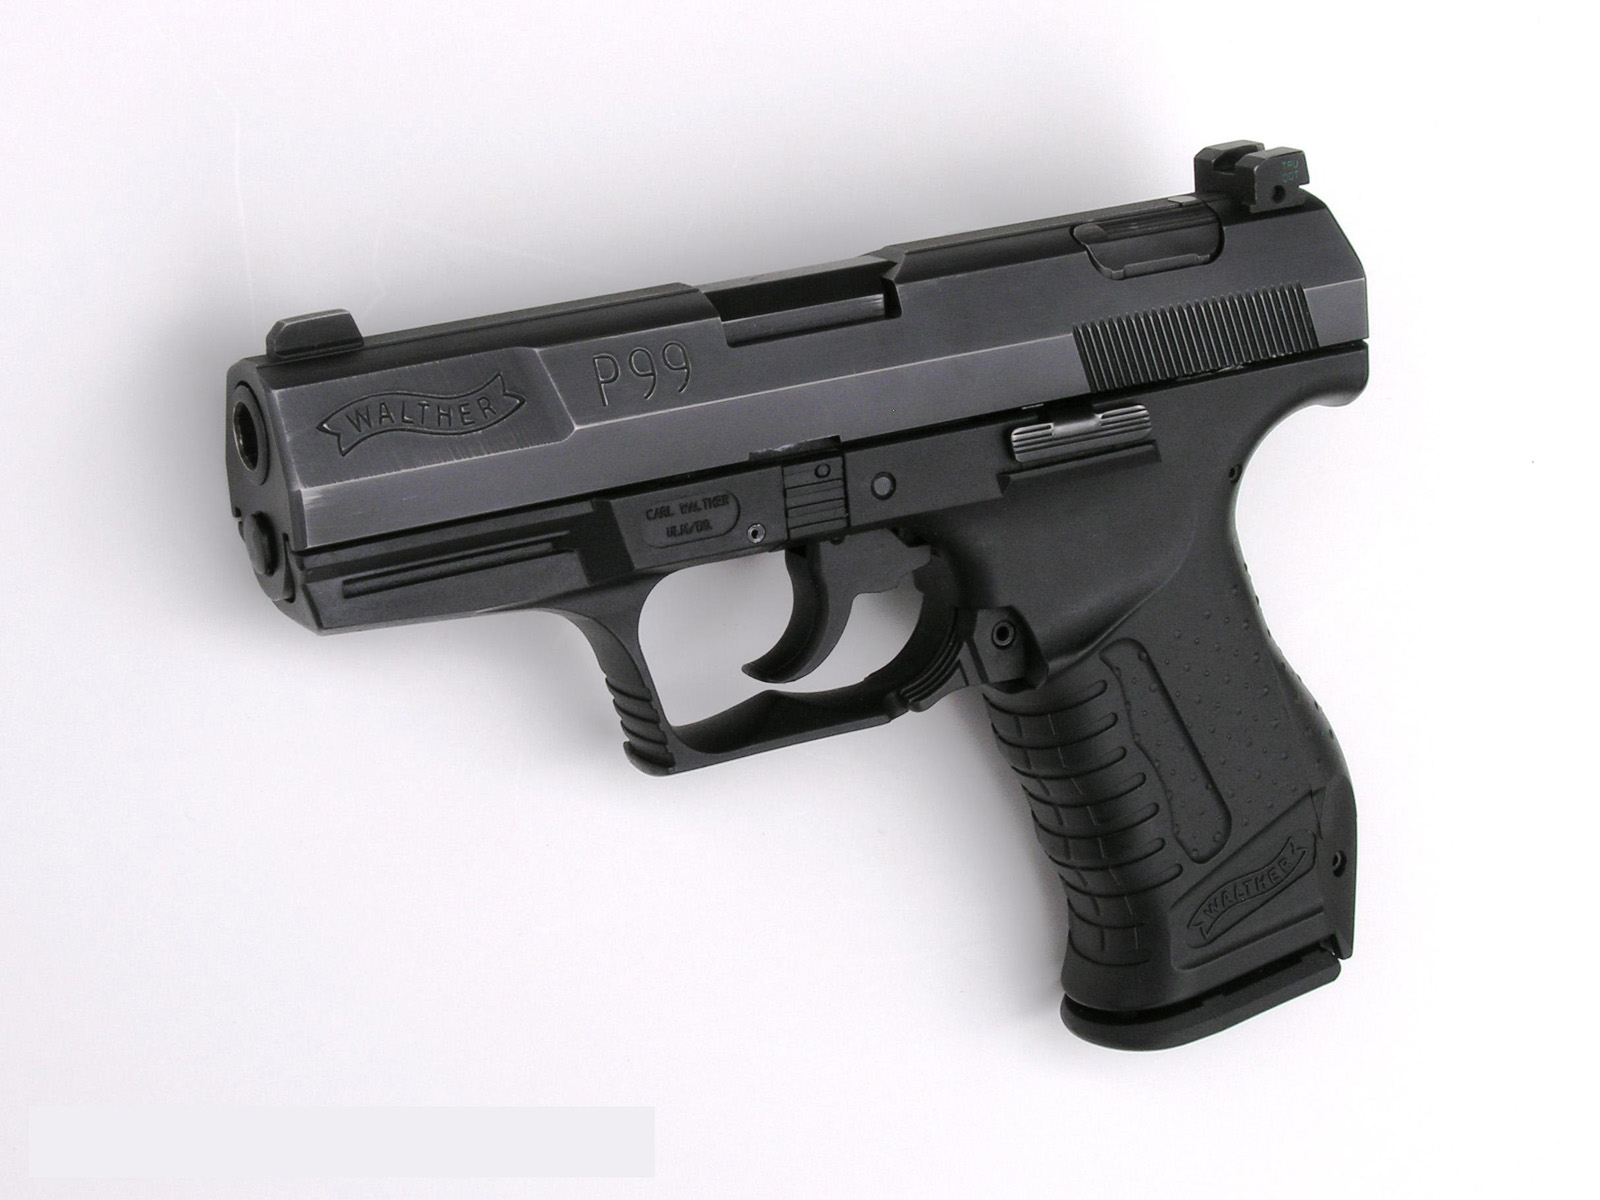 http://2.bp.blogspot.com/-8p62s3YT2I8/Tn1g2RVWONI/AAAAAAAABUQ/eYyzd53twIA/s1600/Walther_PPK_99_9mm_Gun_HD_Weapon_Desktop_Background_Psuperos_Vvallpaper.net.jpg